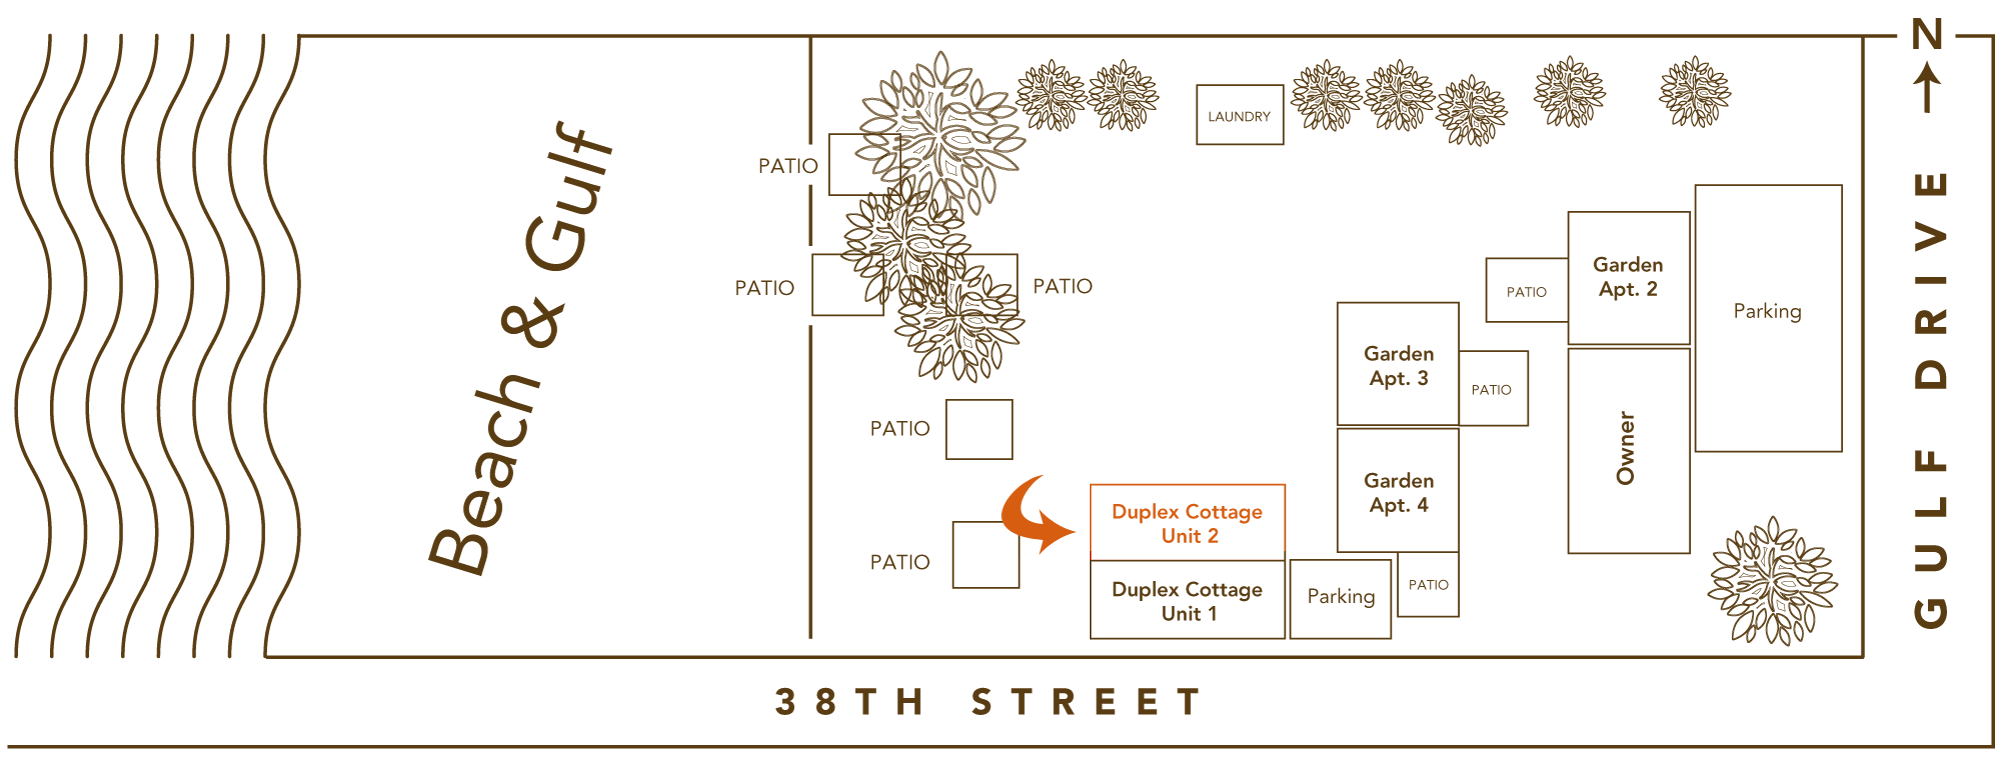 Duplex Cottage C2 Site Plan